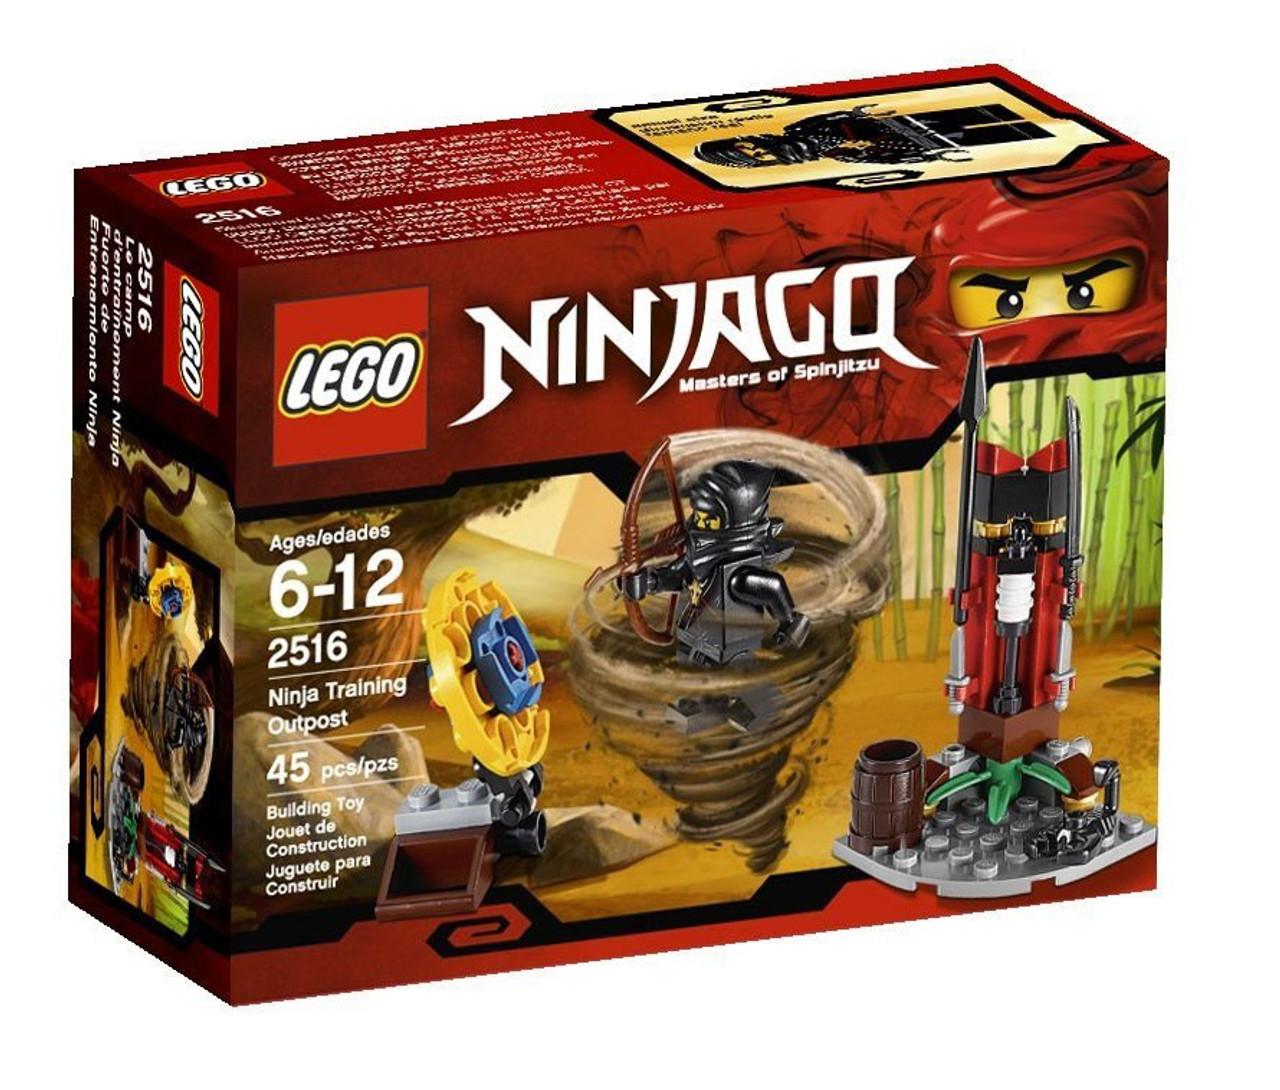 Ninjago Set2516 Ninja Outpost Lego Training vnmN80w